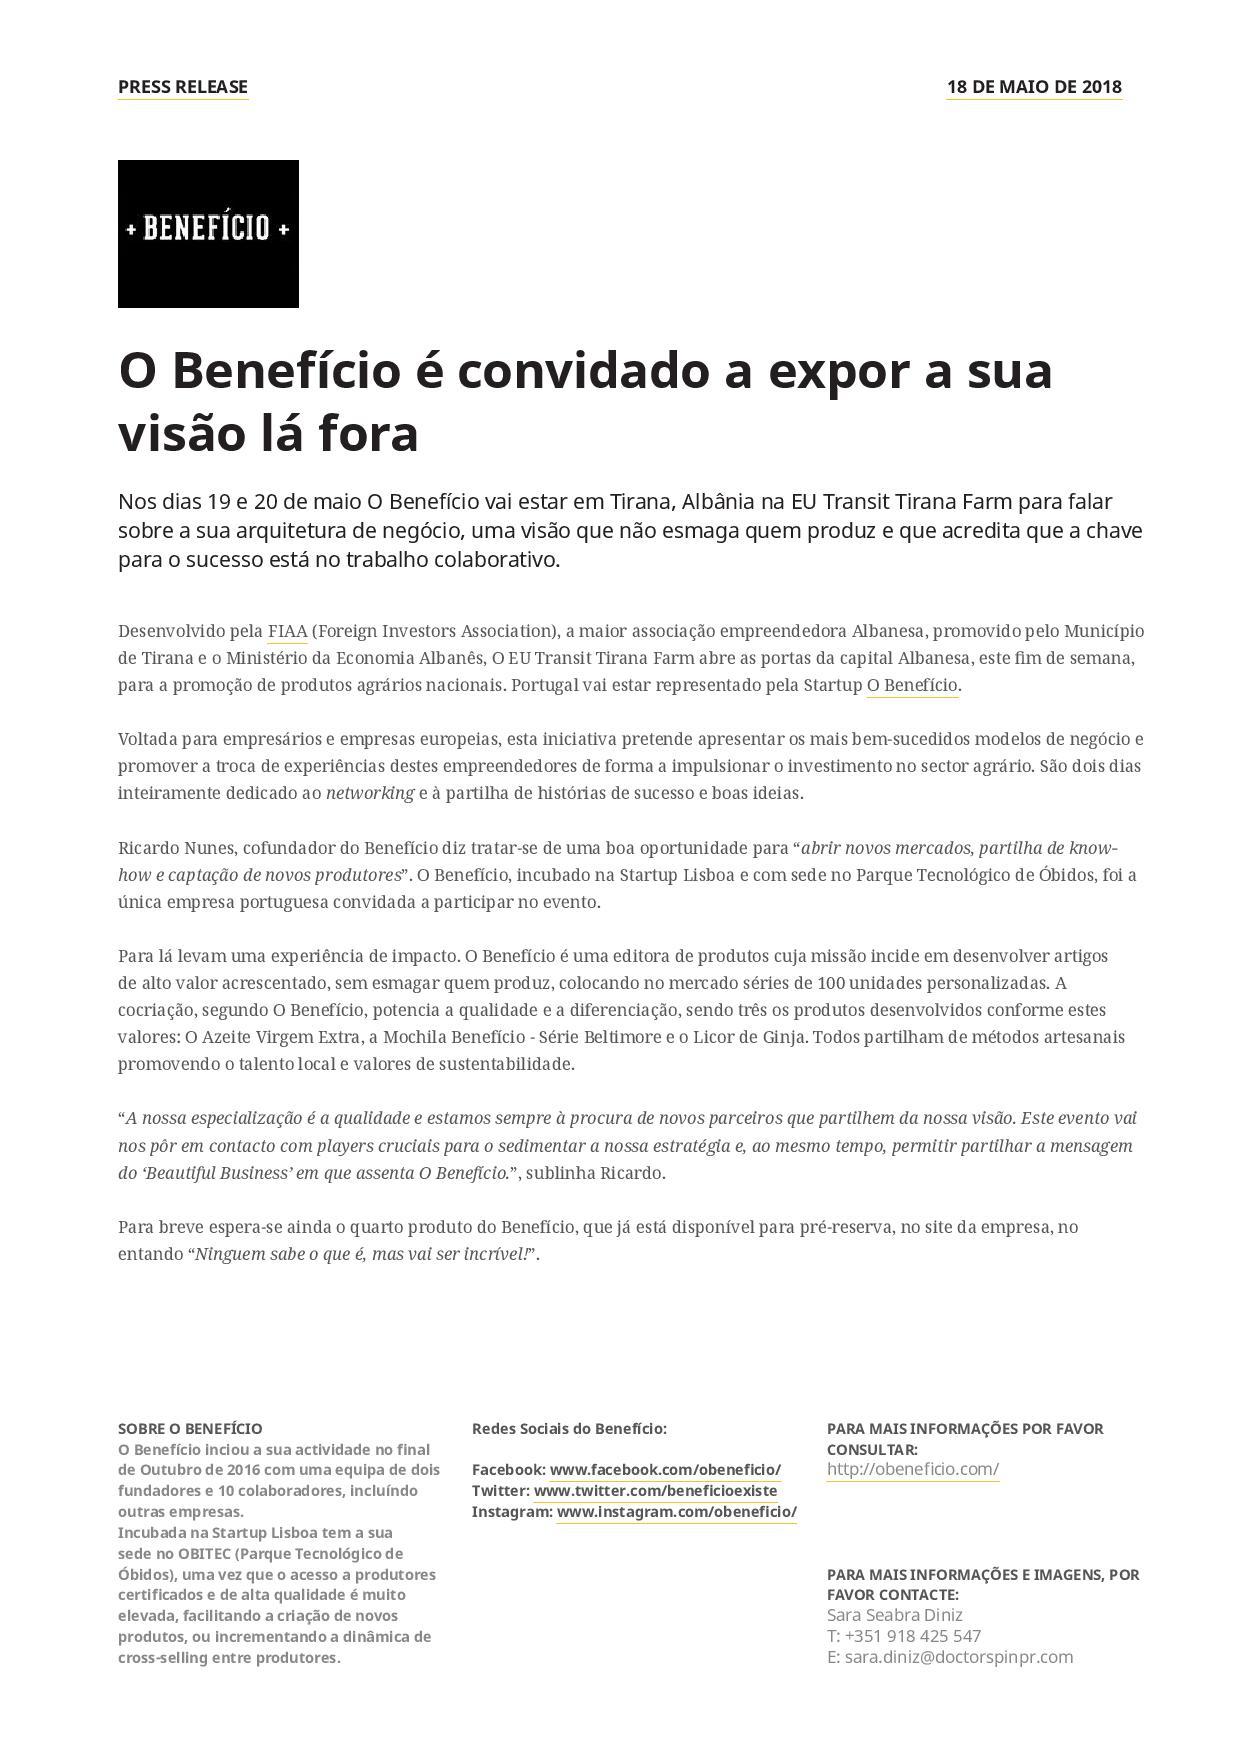 PressRelease_Albânia-page-001.jpg